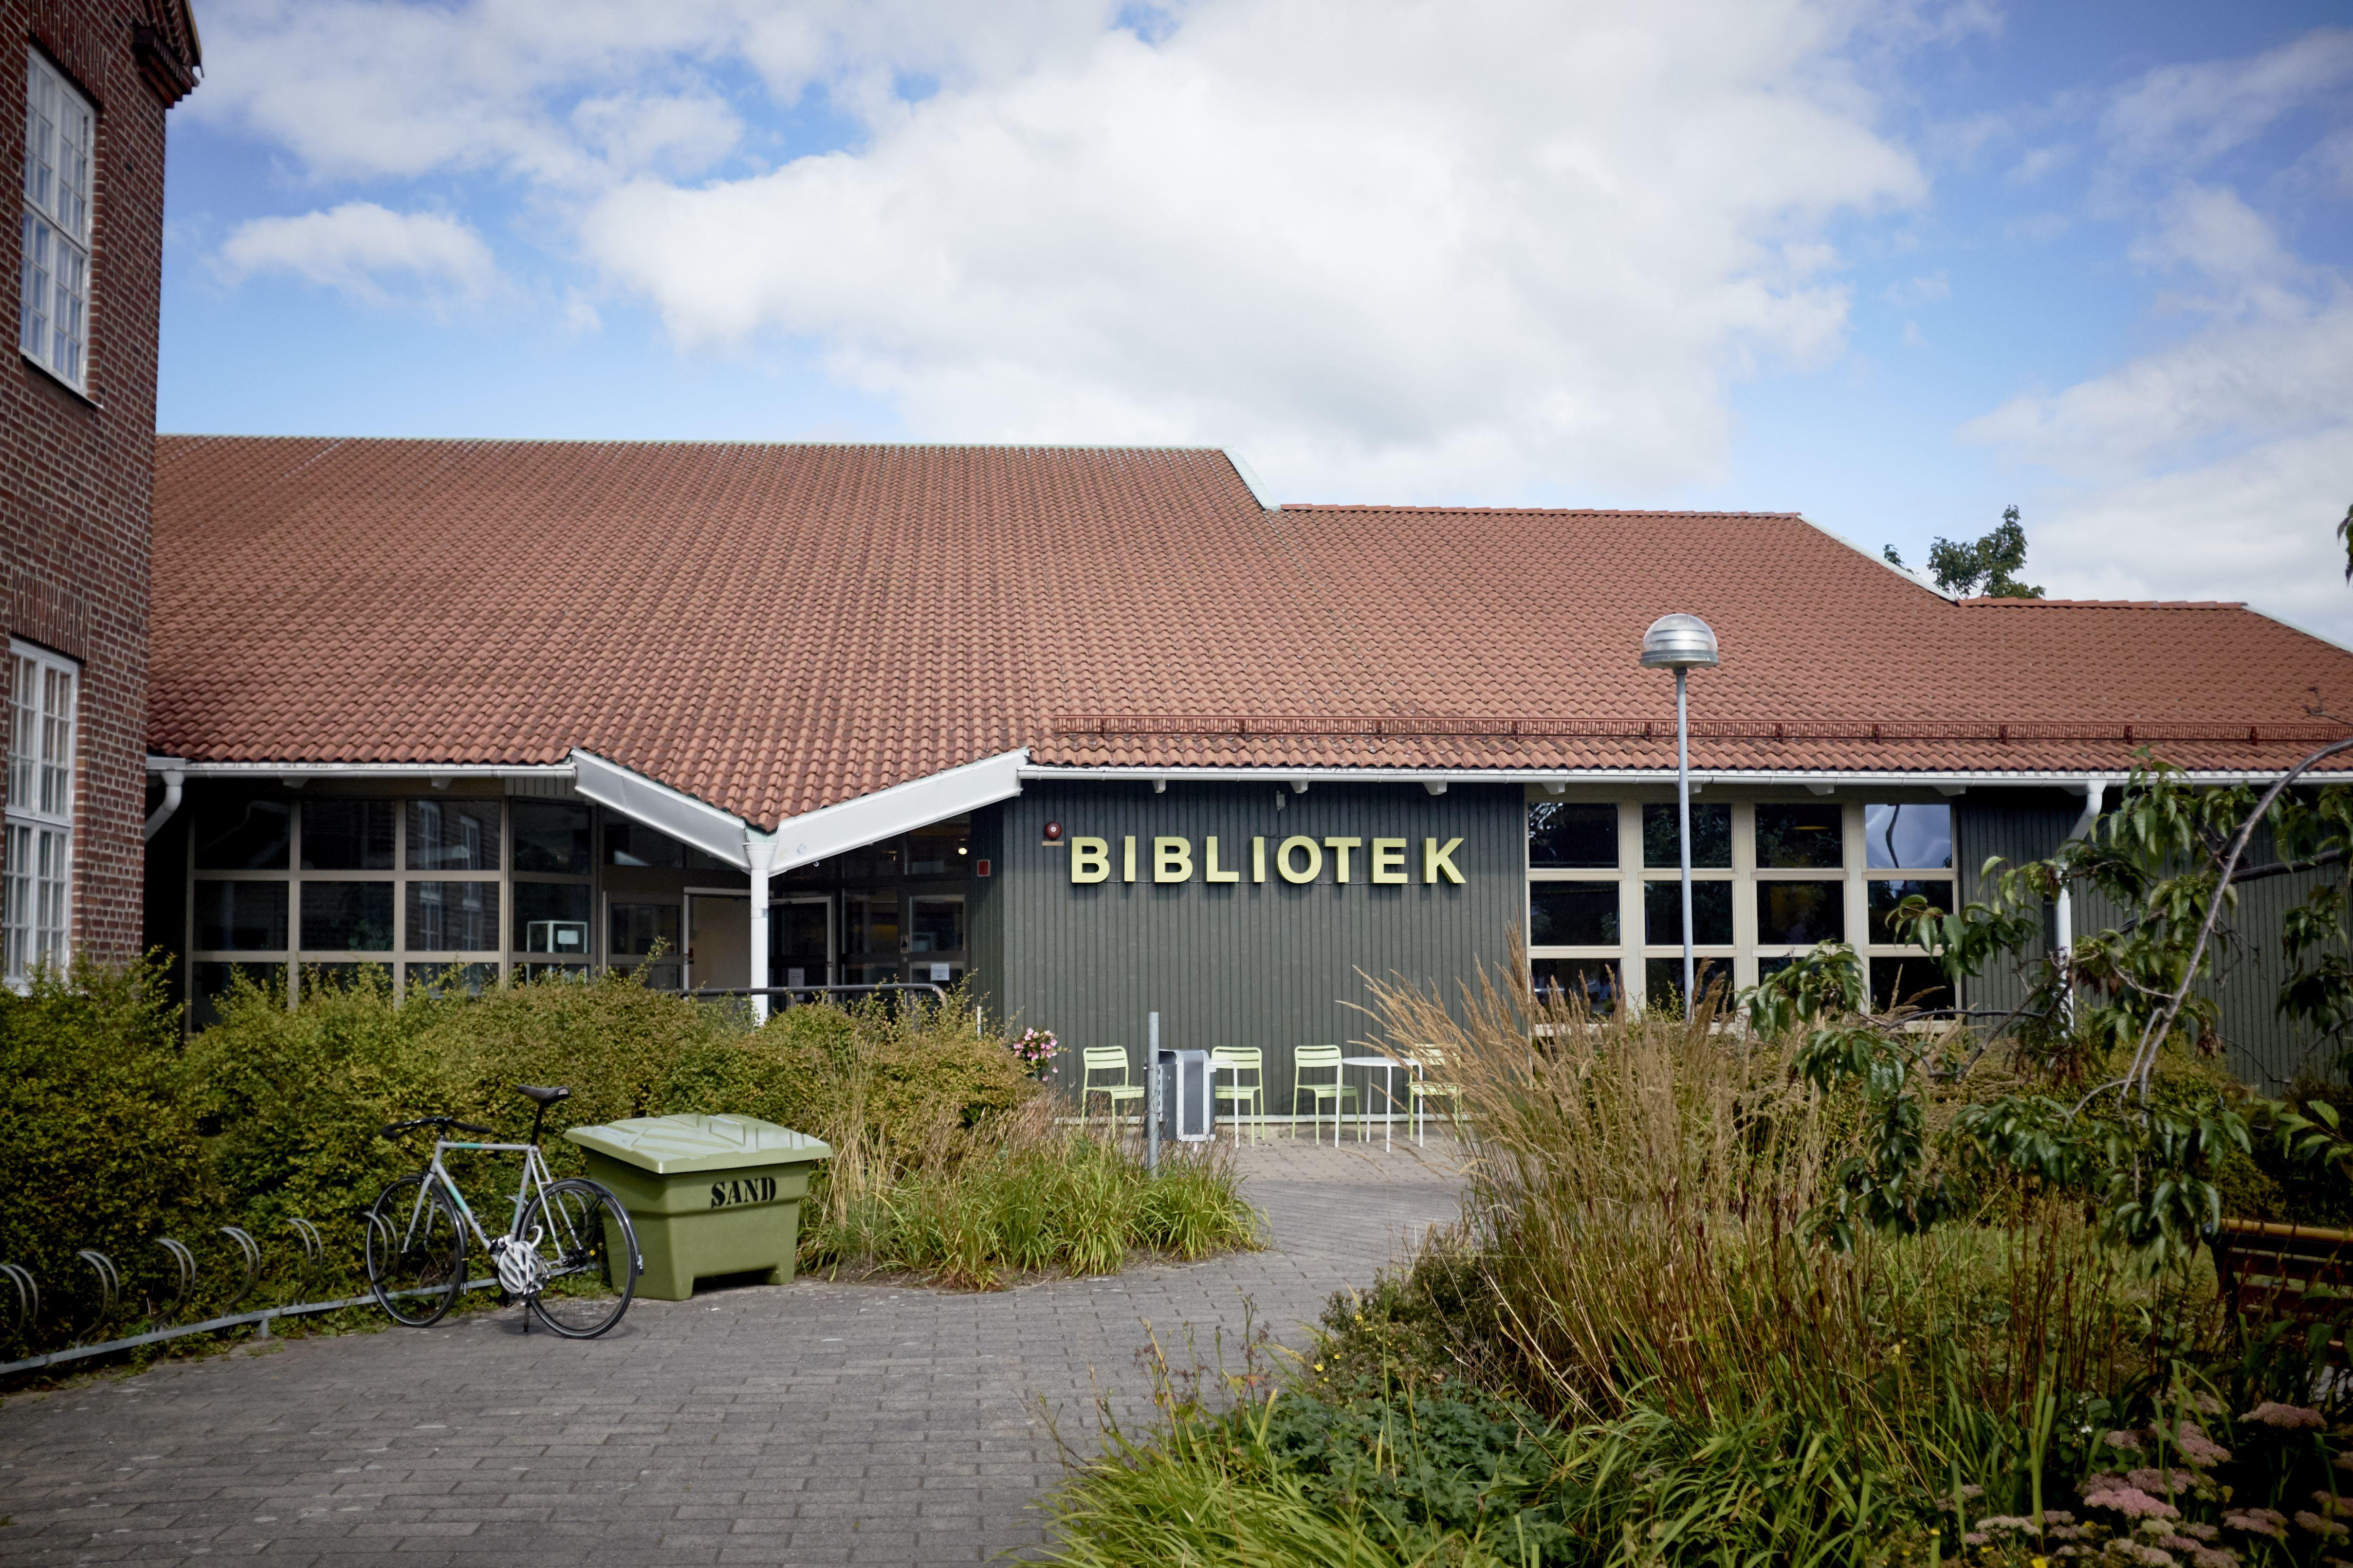 Älmhults bibliotek